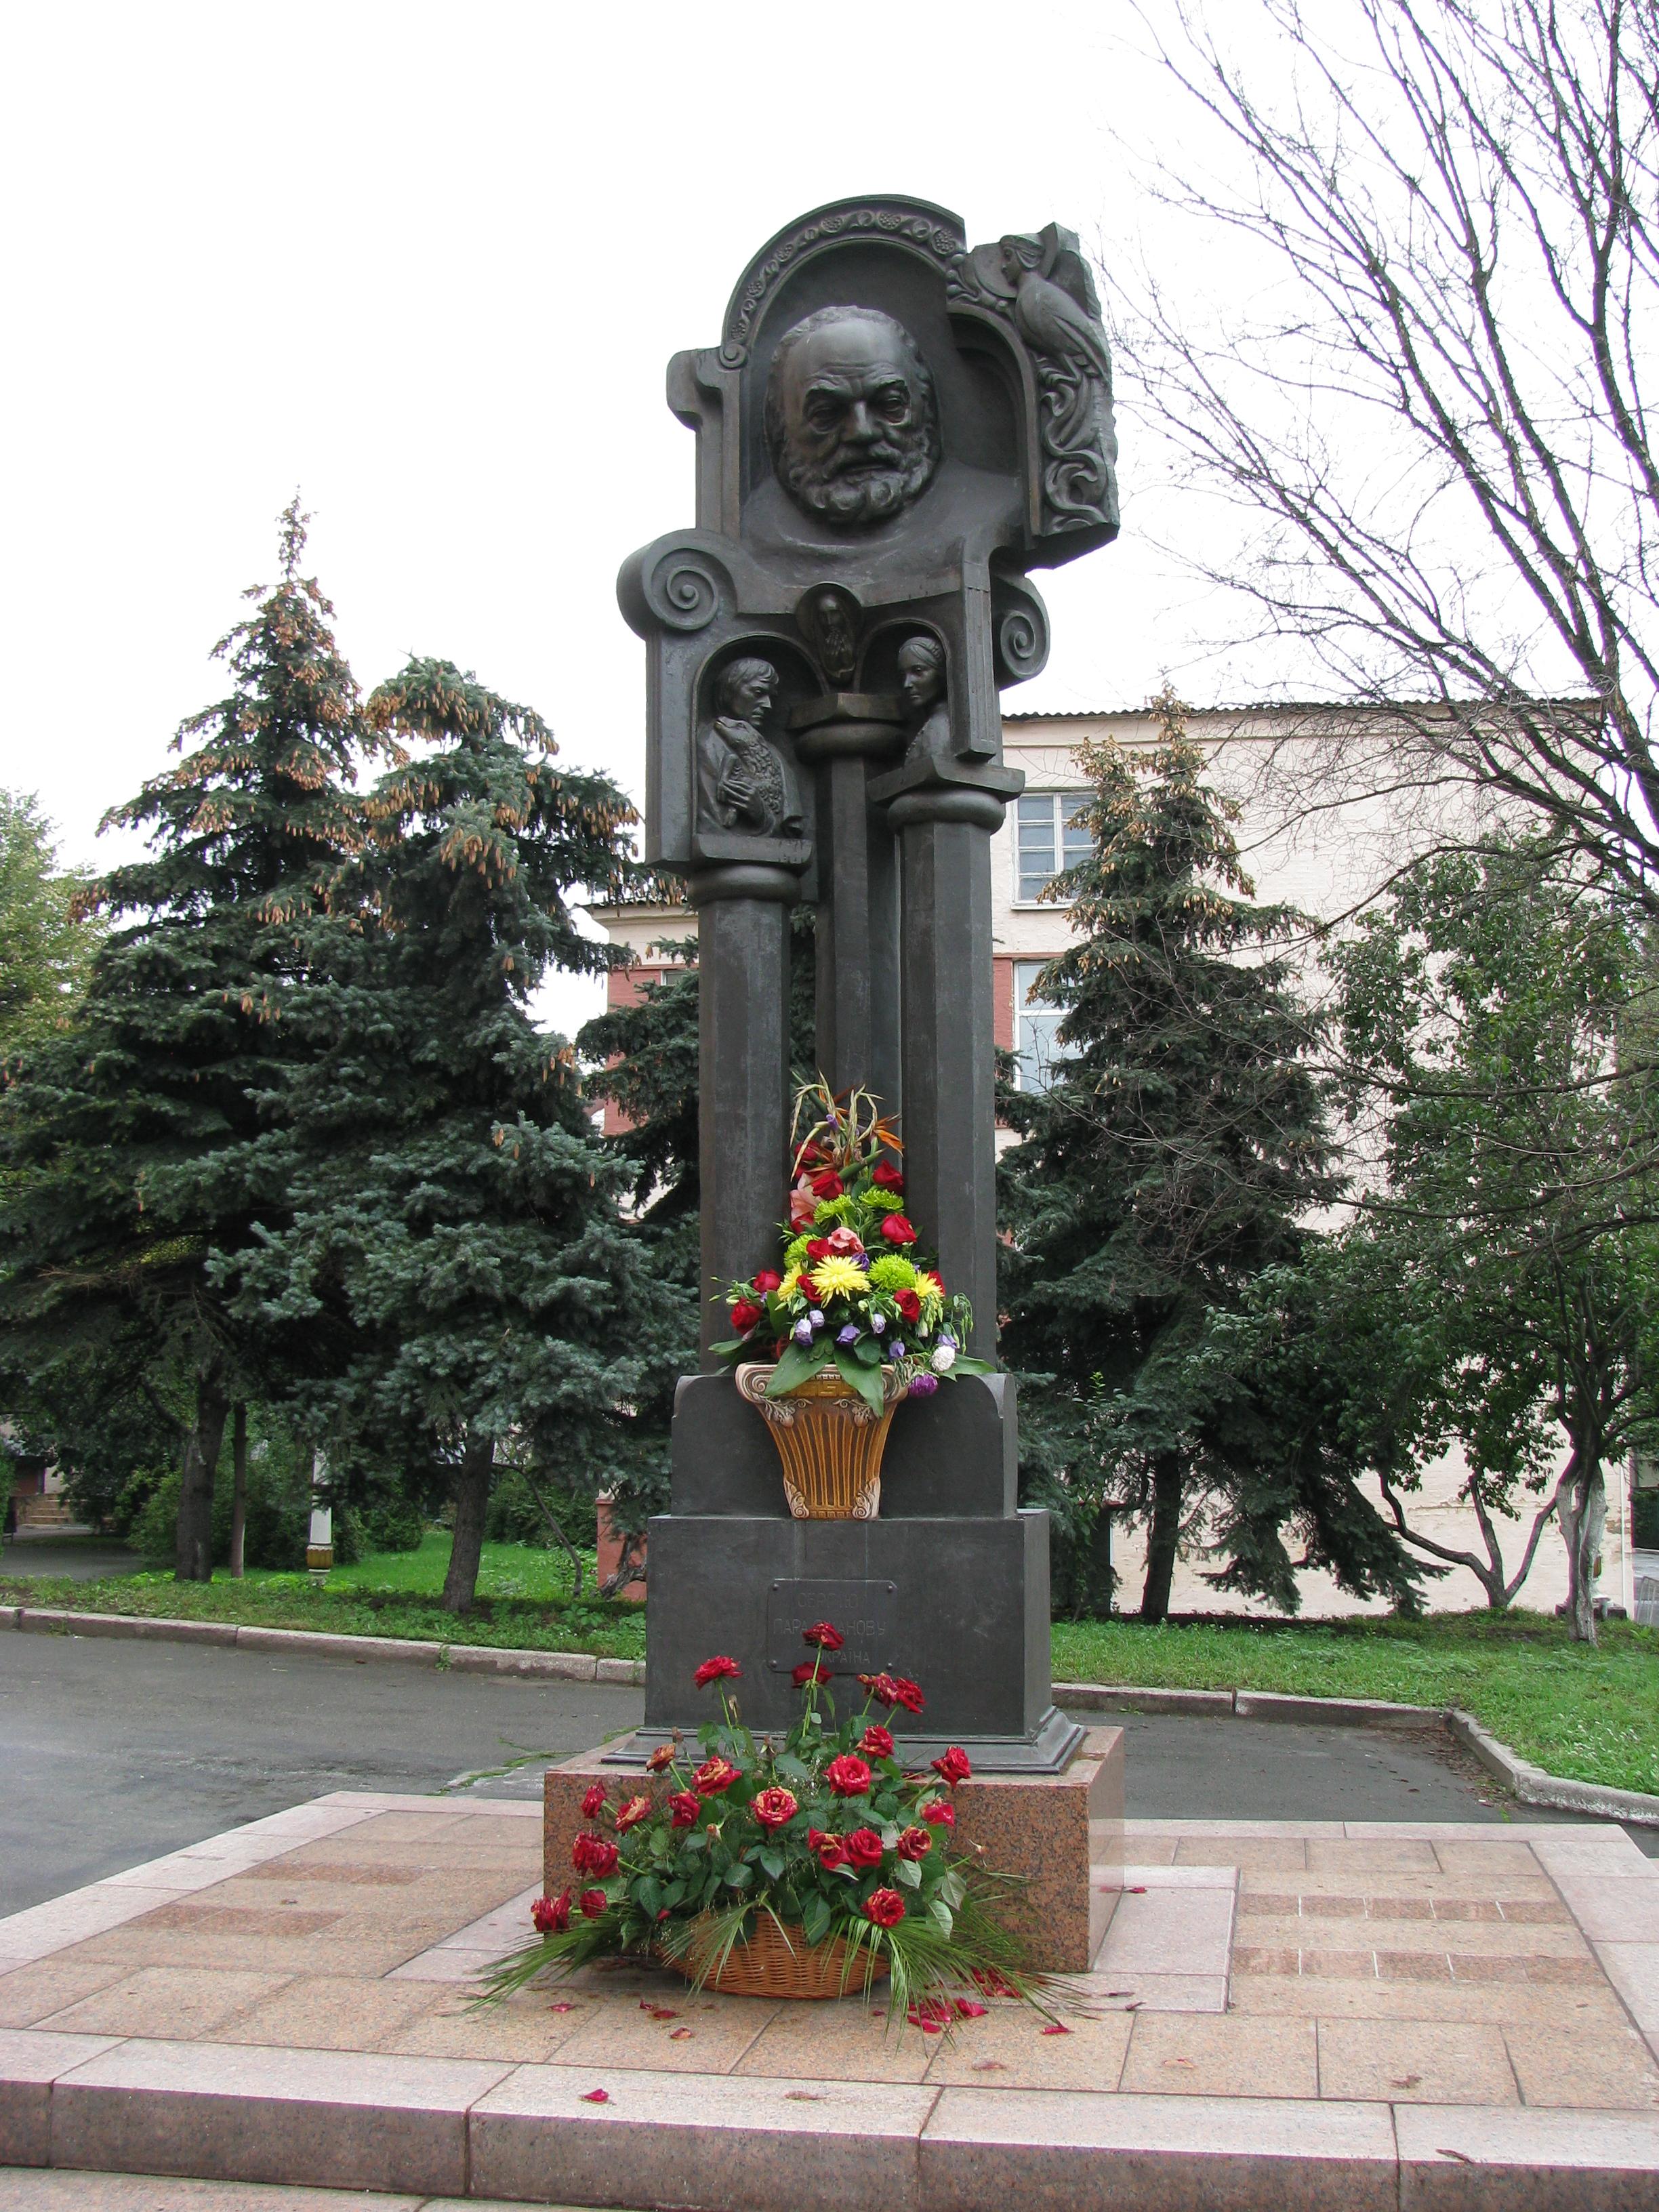 https://upload.wikimedia.org/wikipedia/uk/2/2b/Paradzhanov1_NoFoP.jpg